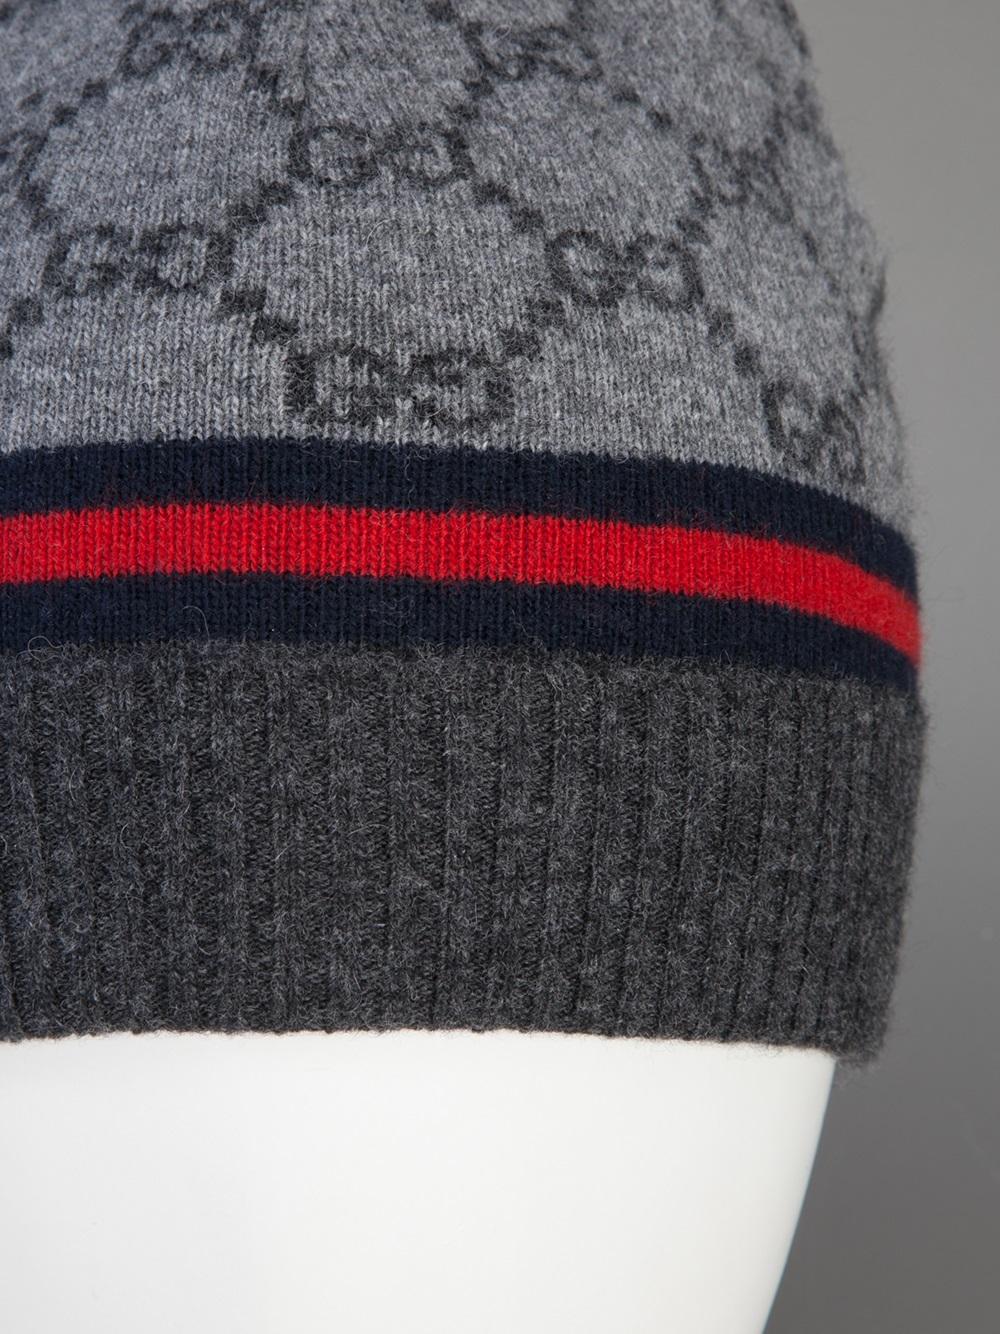 eff8a35a0e73 Lyst - Gucci Monogram Beanie Hat in Gray